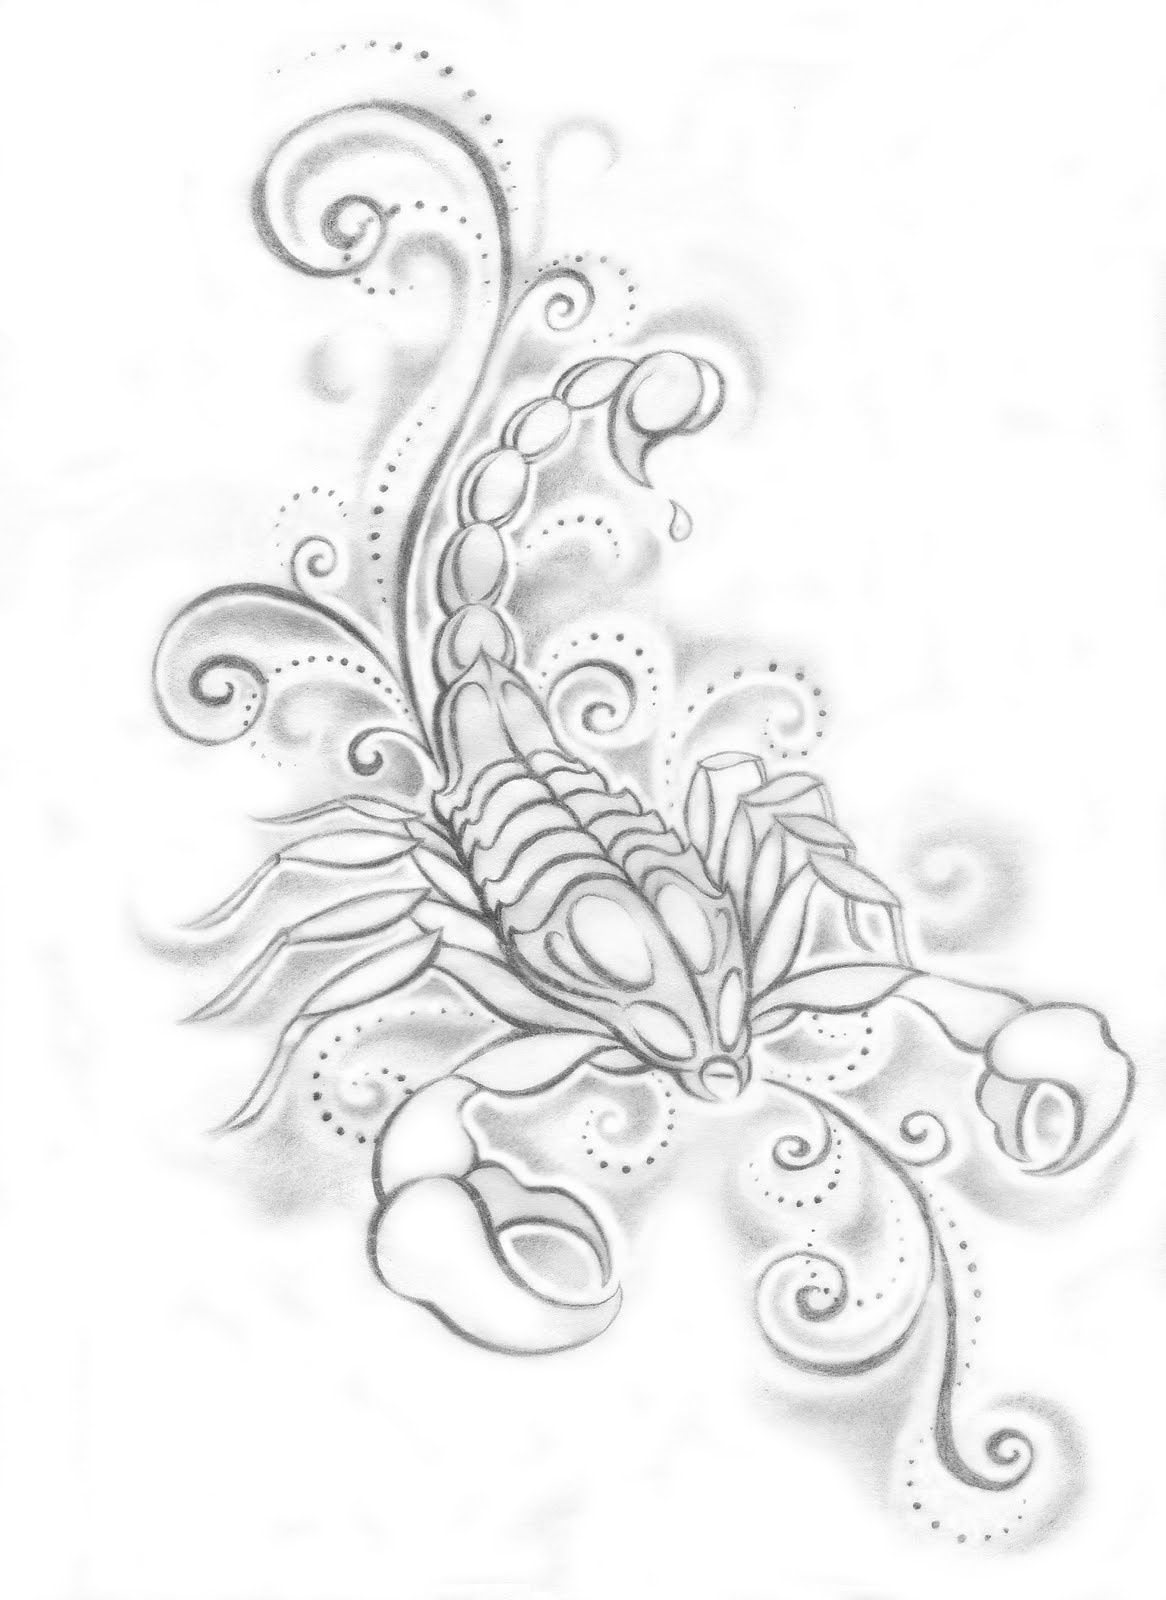 girly scorpion tattoo skorpion tattoo pinterest. Black Bedroom Furniture Sets. Home Design Ideas